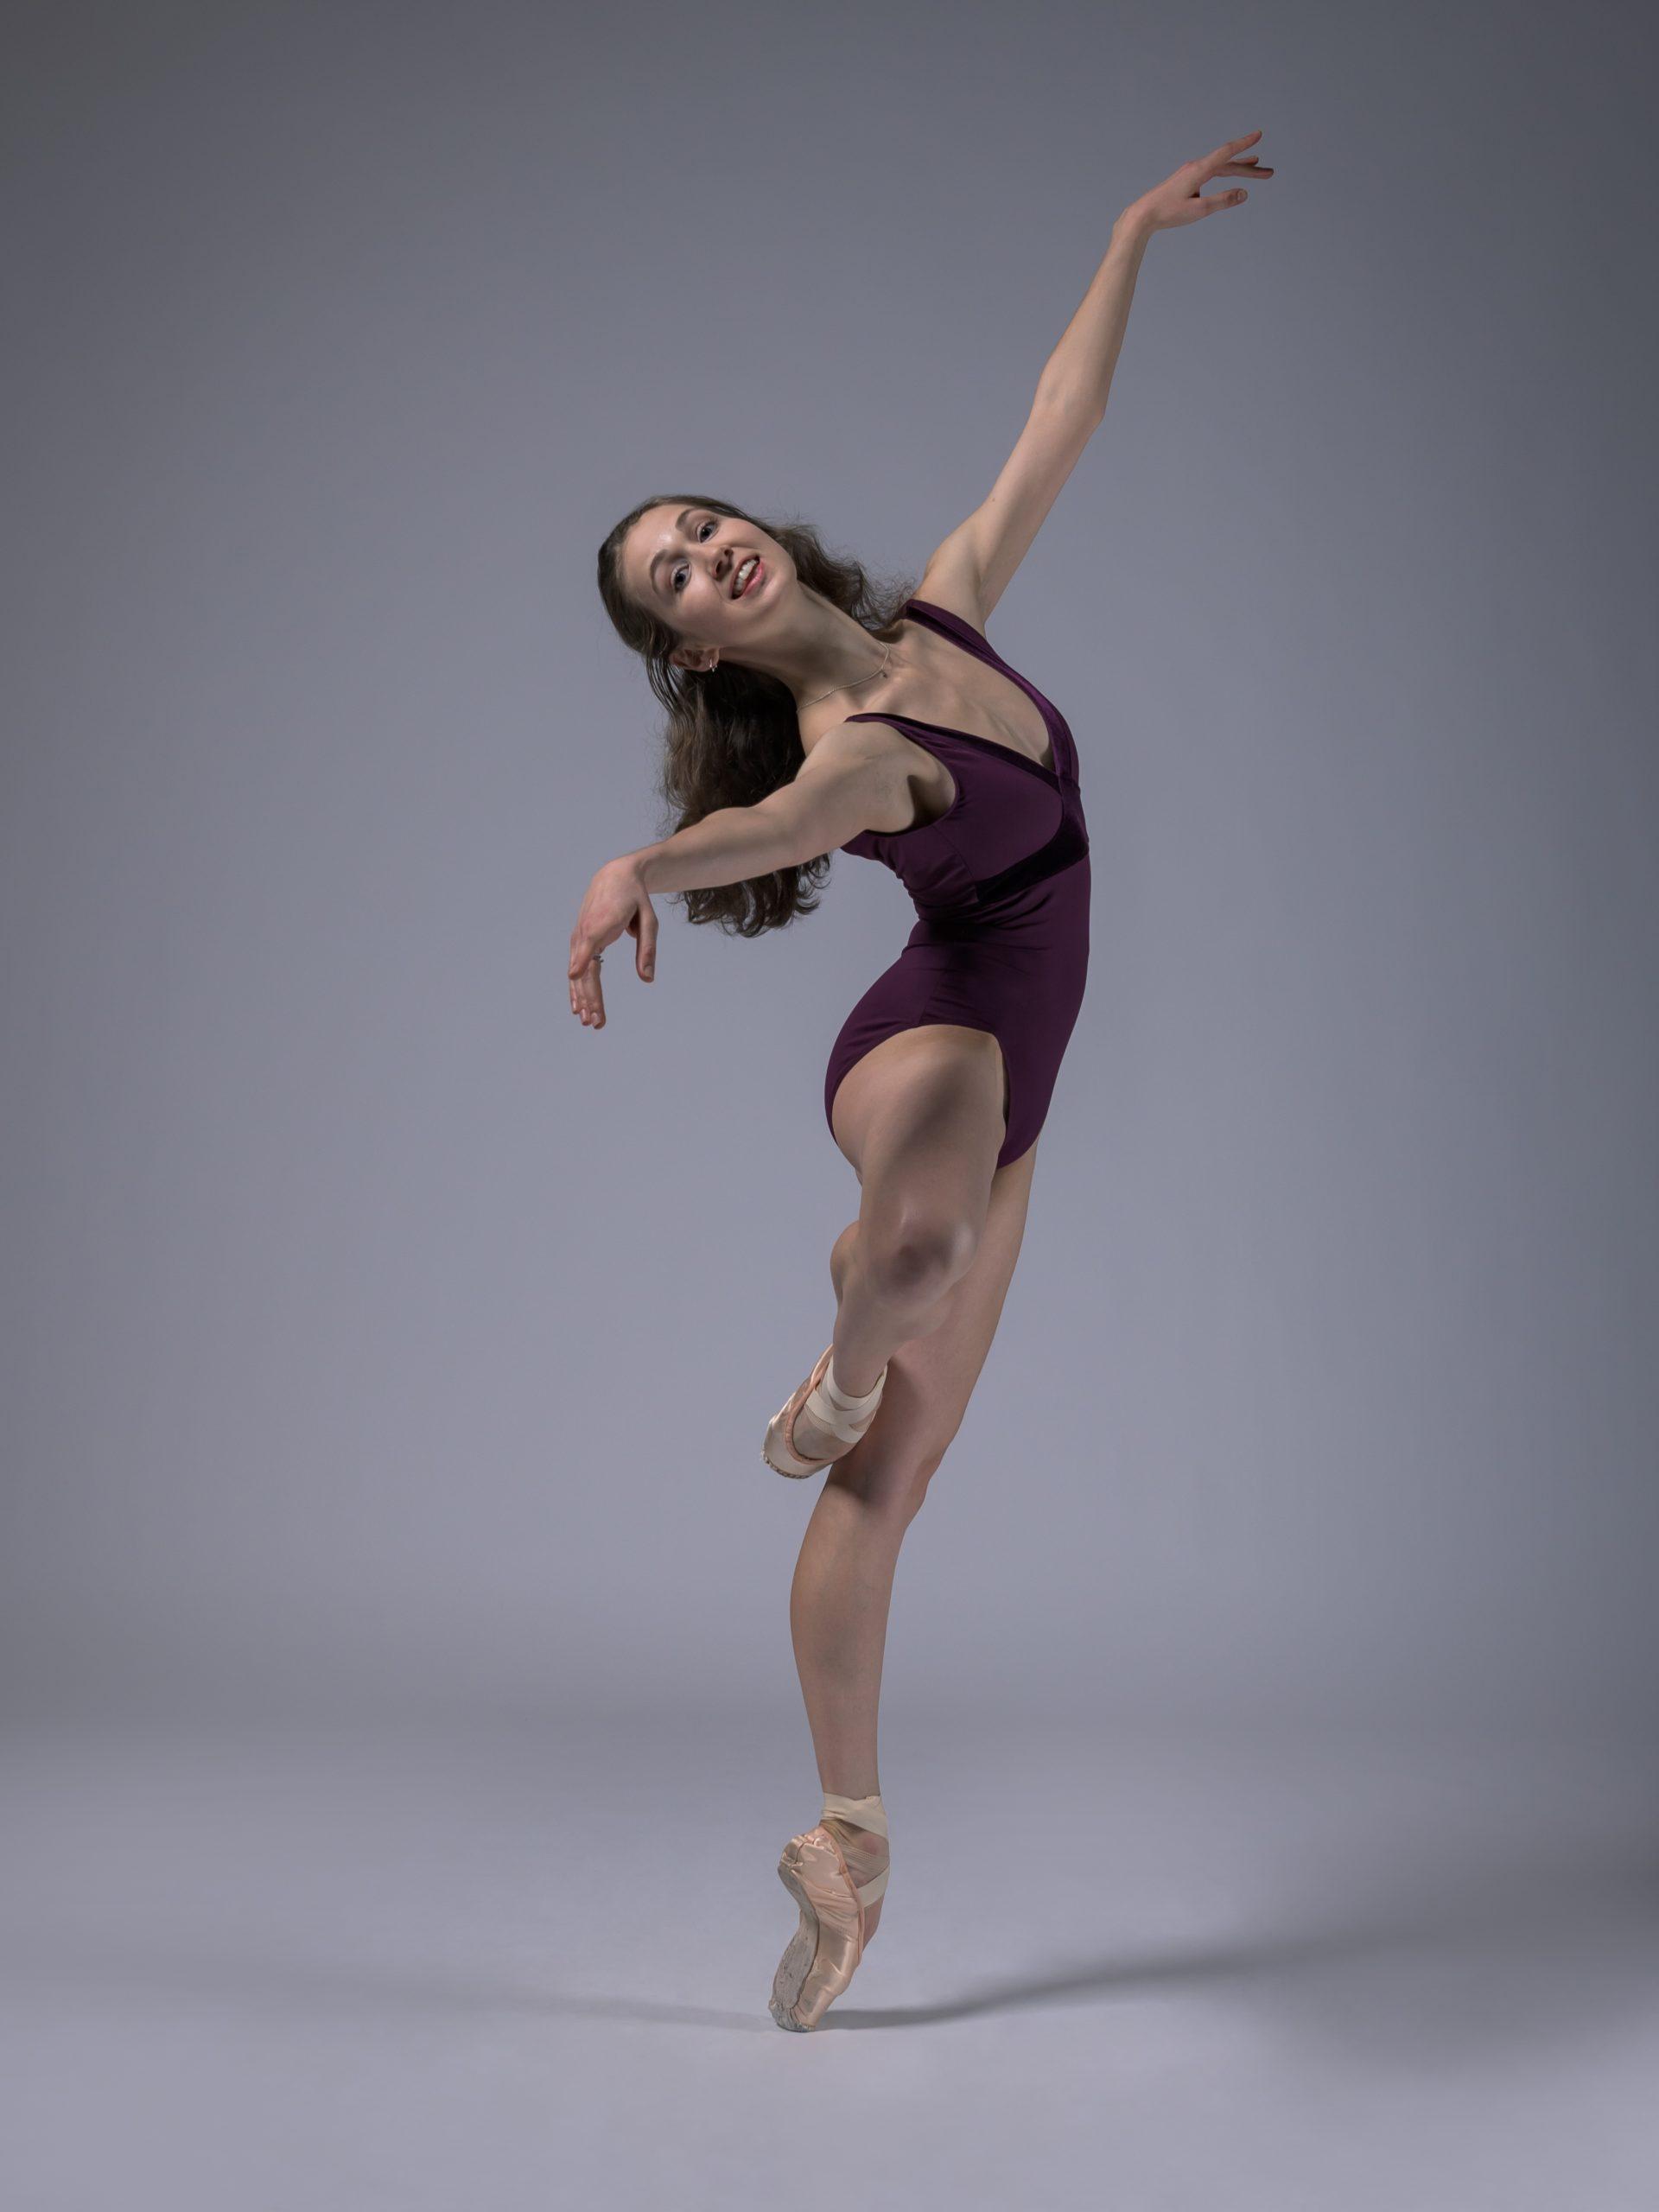 Eloise Hazlewood